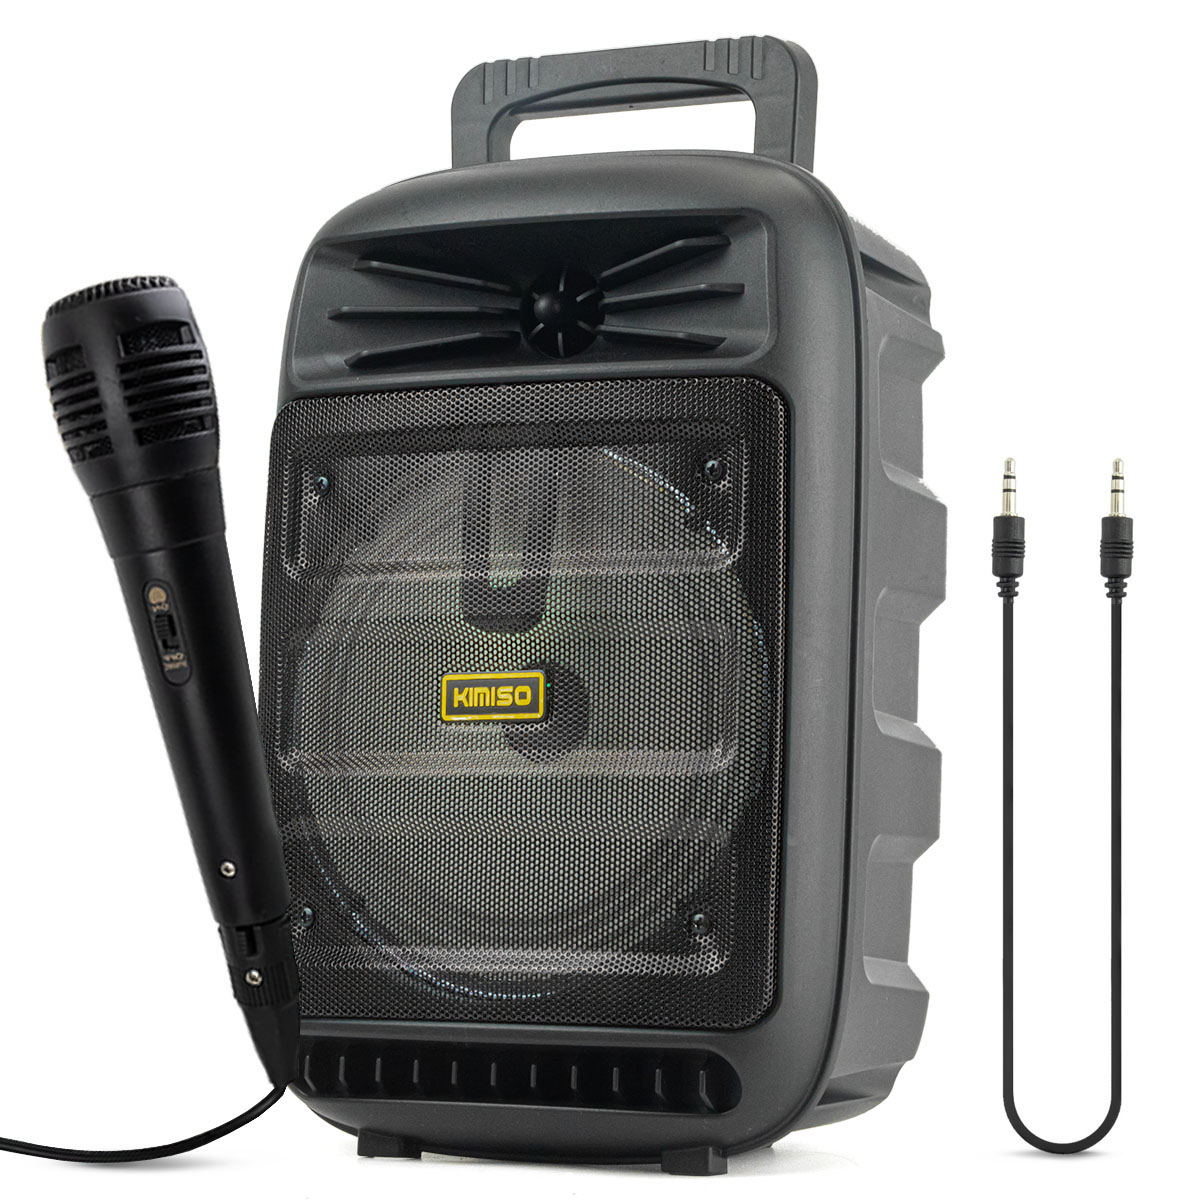 Caixa de Som Bluetooth Portátil 10 Watts RMS com Microfone Kimiso KMS-3385